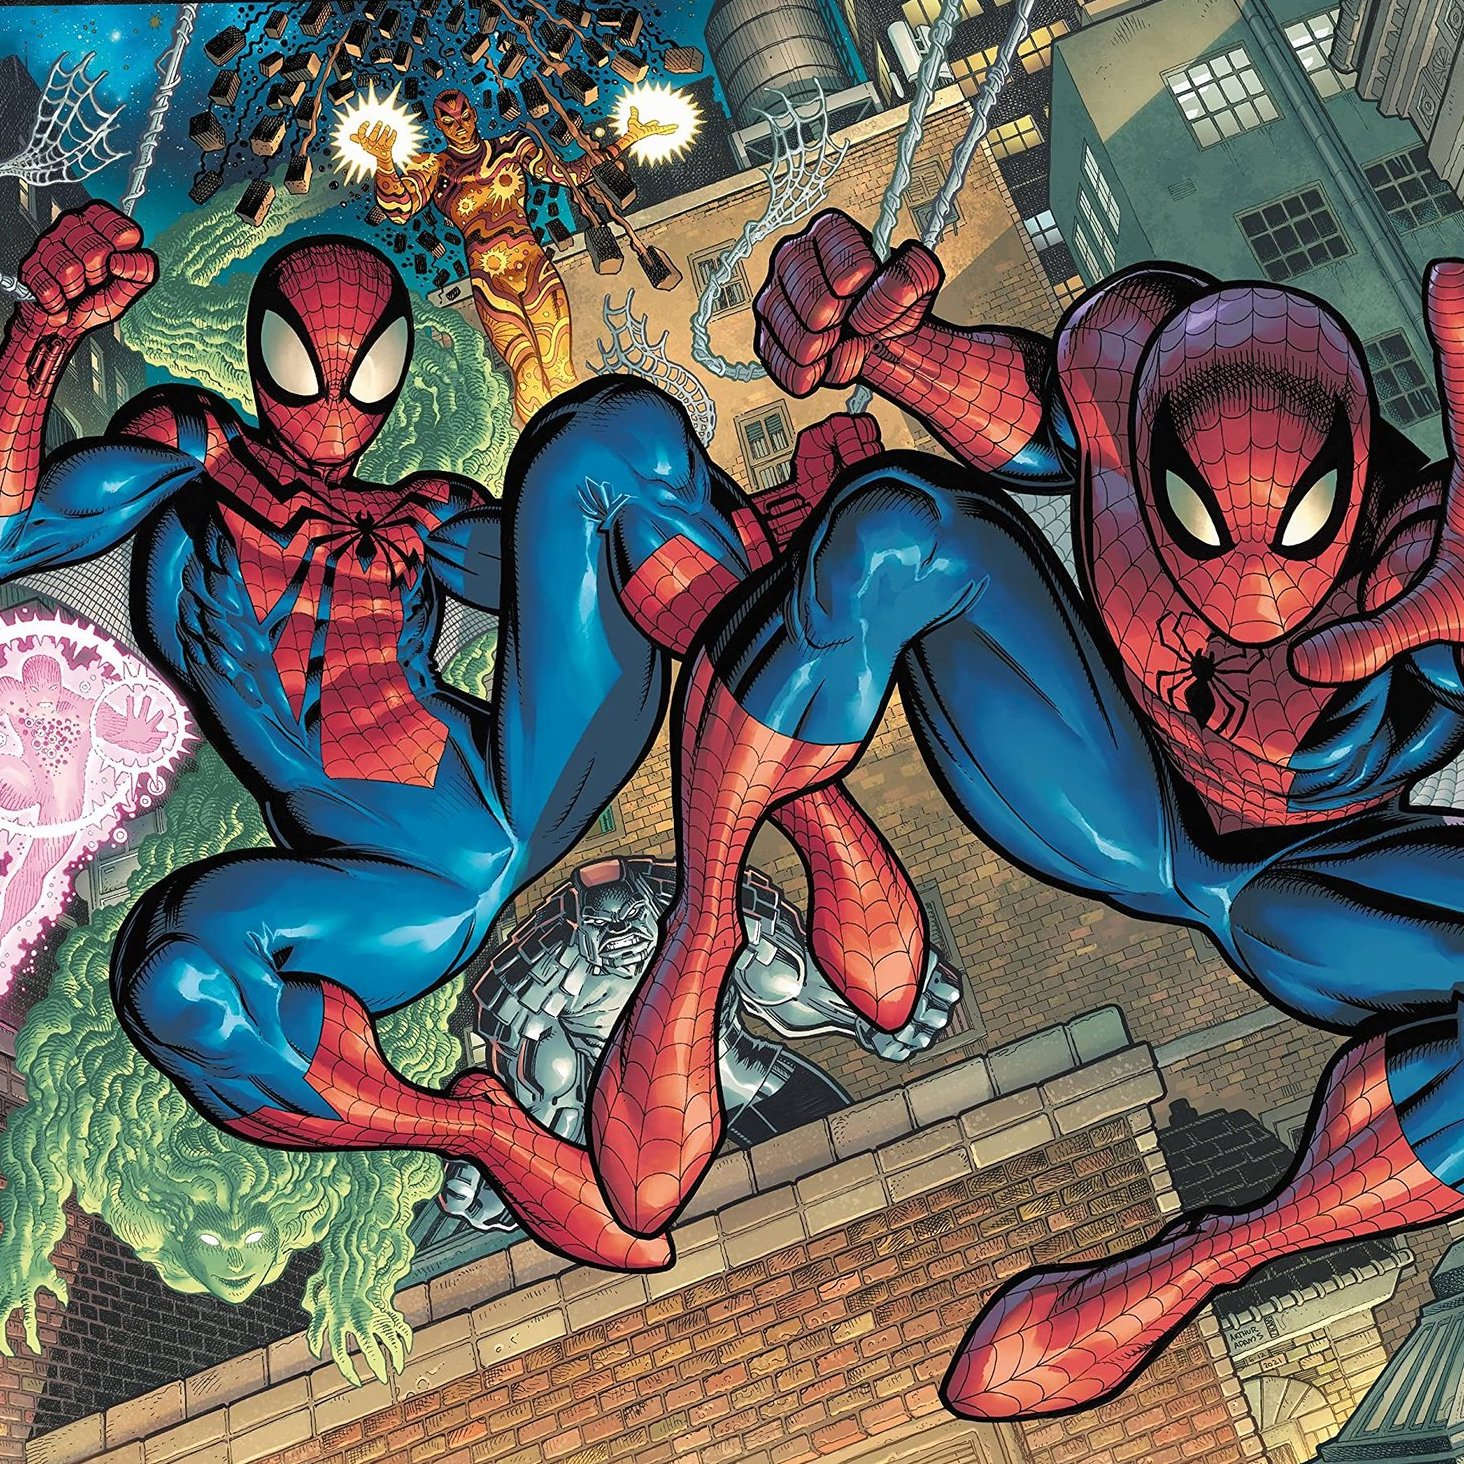 Image via Marvel Entertainment for 360 Magazine